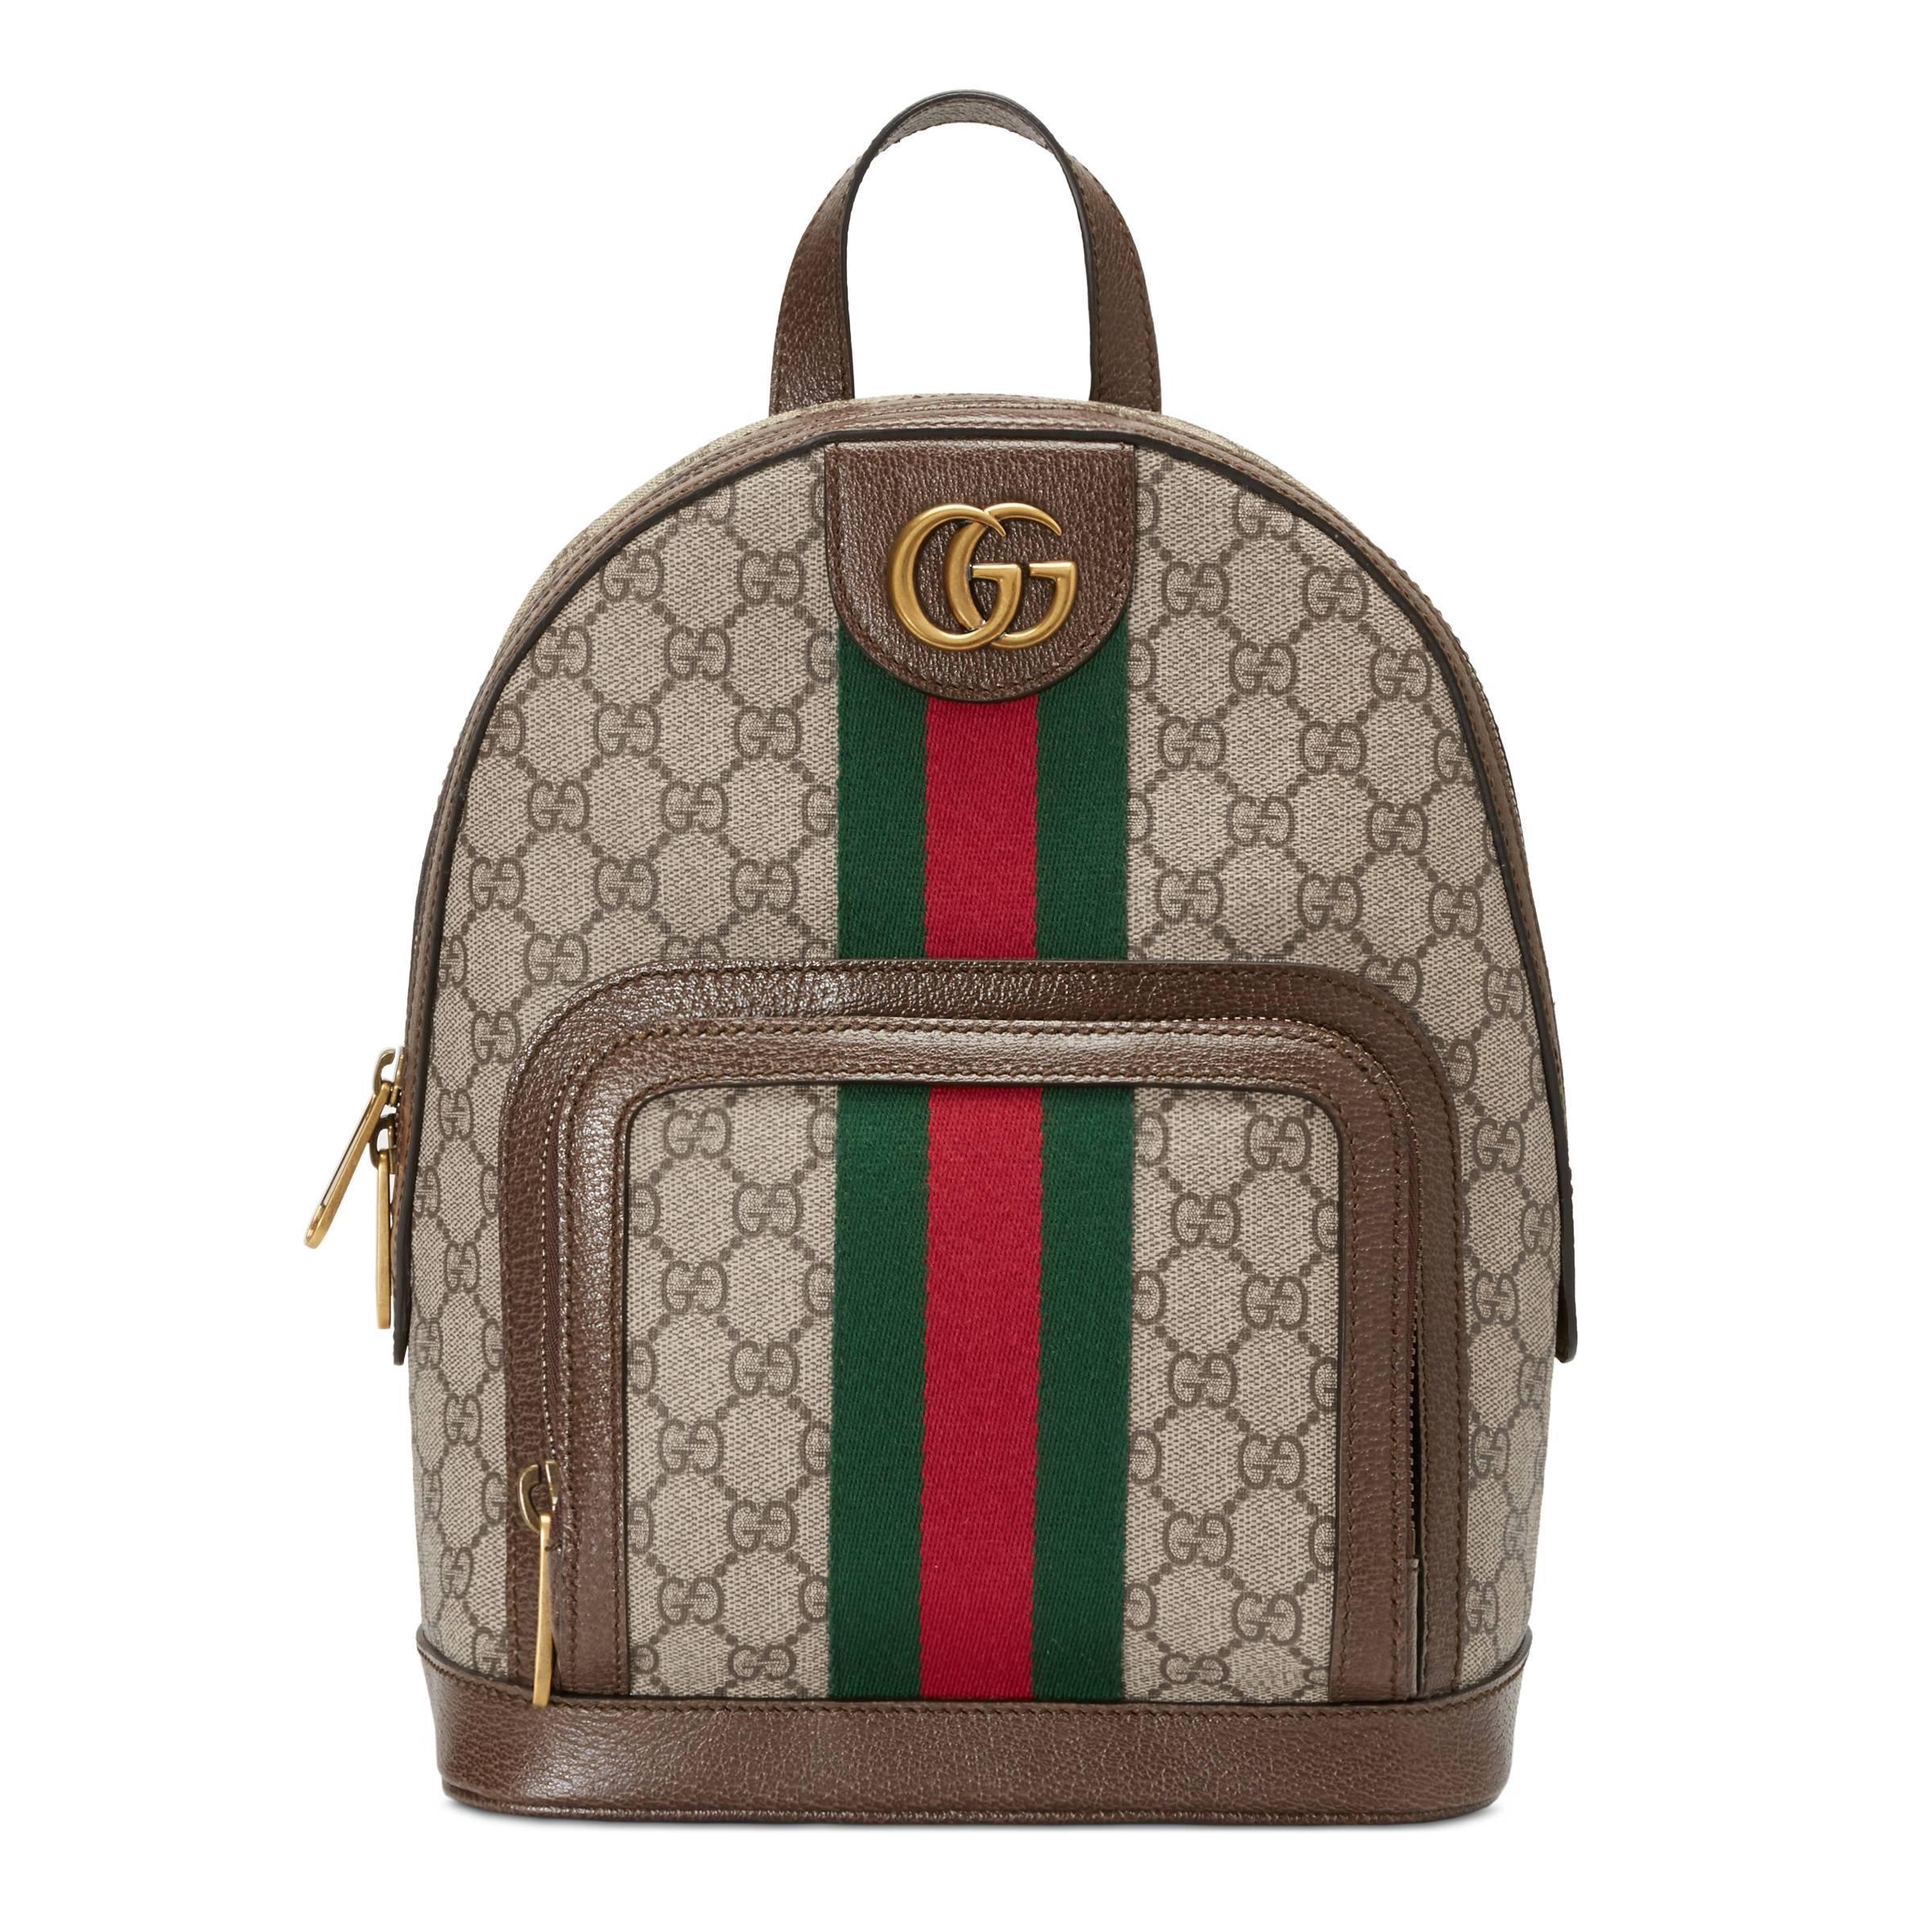 c170e2240 Gucci - Multicolor Mochila Ophidia Pequeña con GG - Lyst. Ver en pantalla  completa